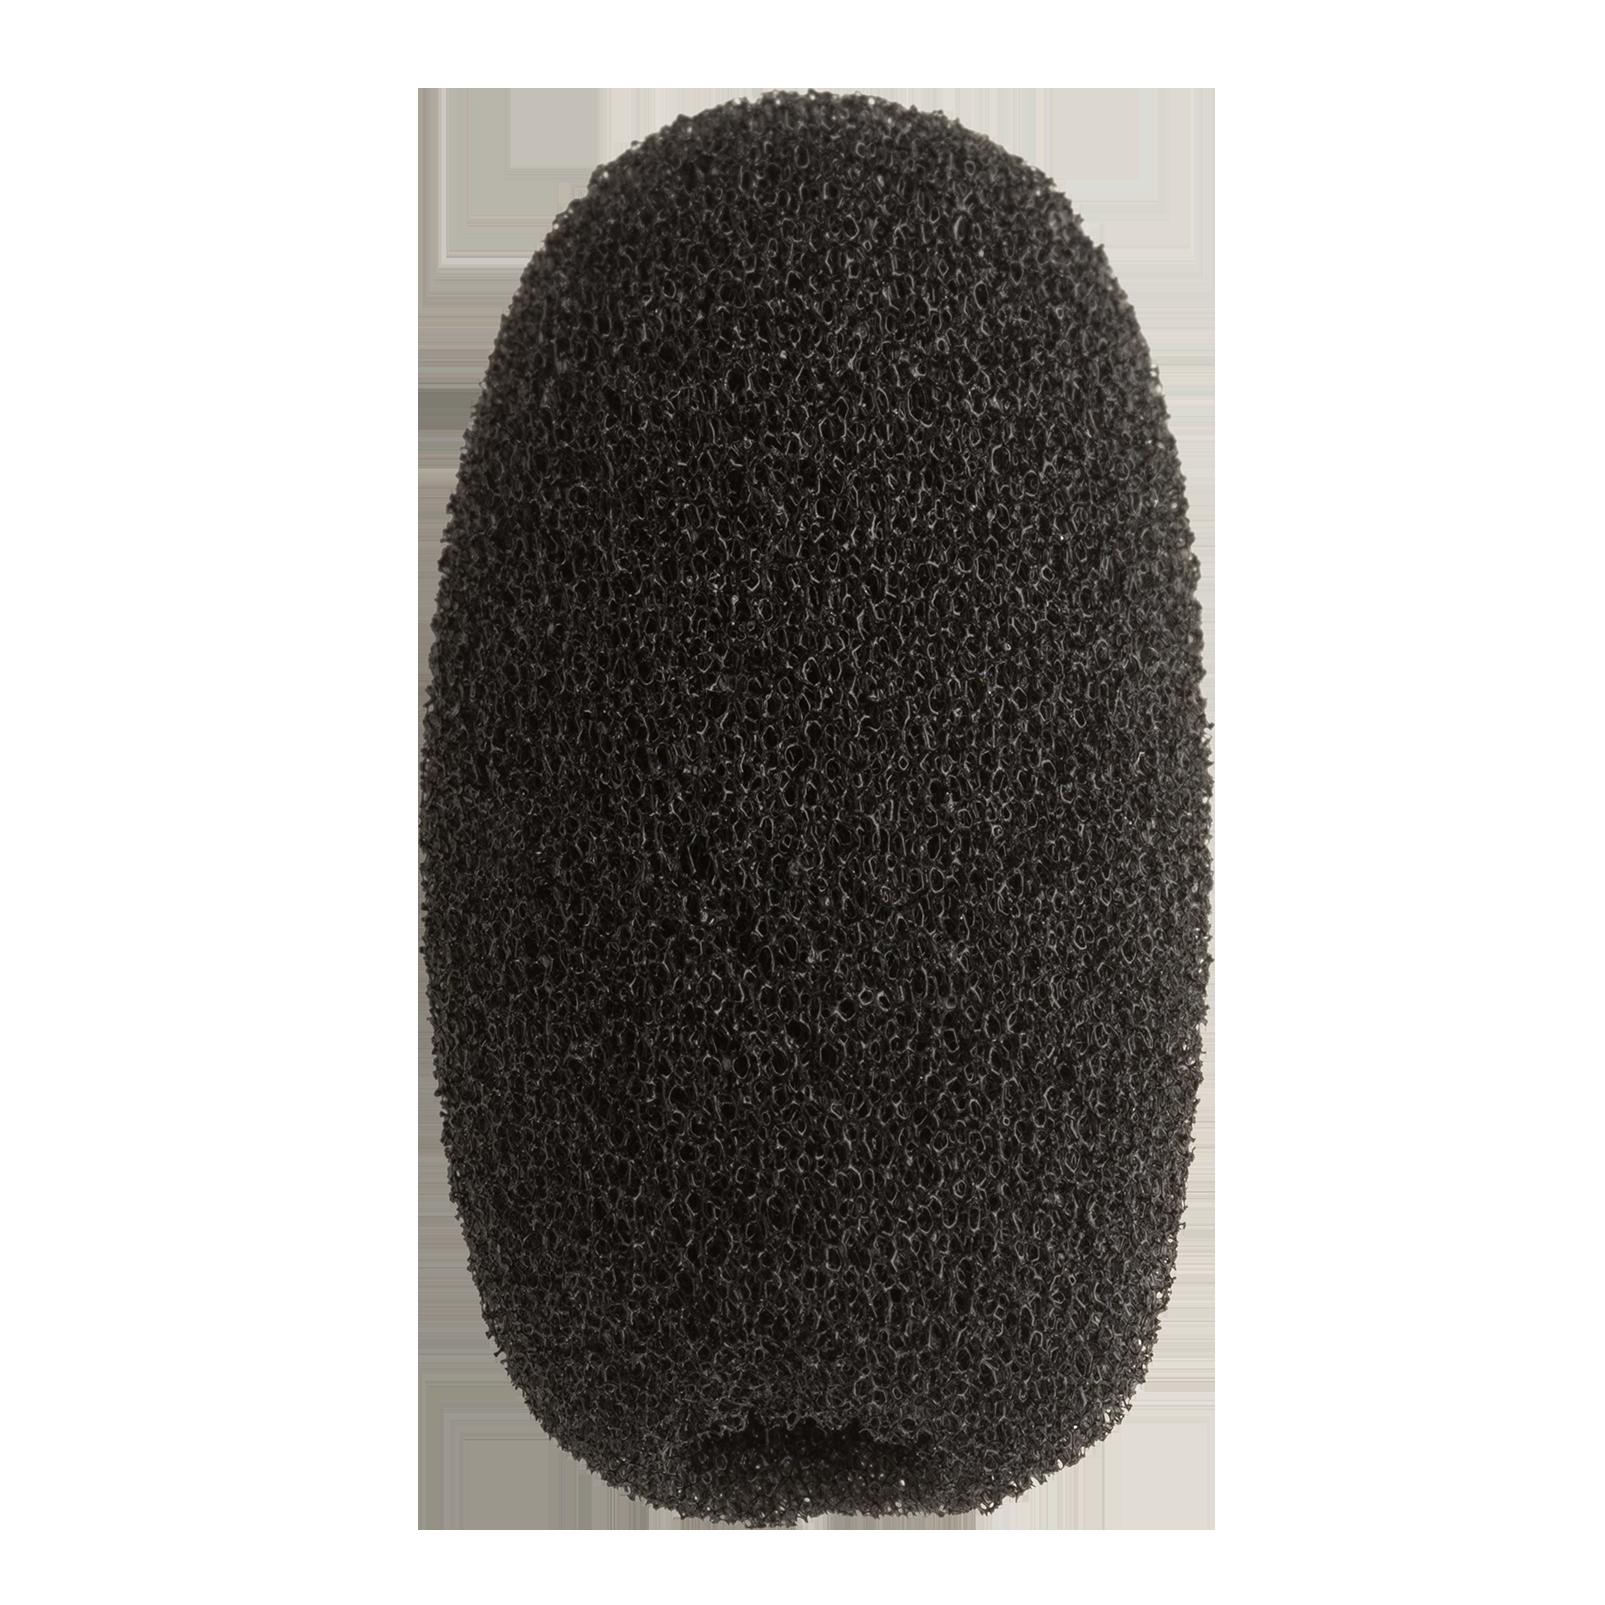 JBL Microphone sponge for Quantum 100 - Black - Wind cap - Hero